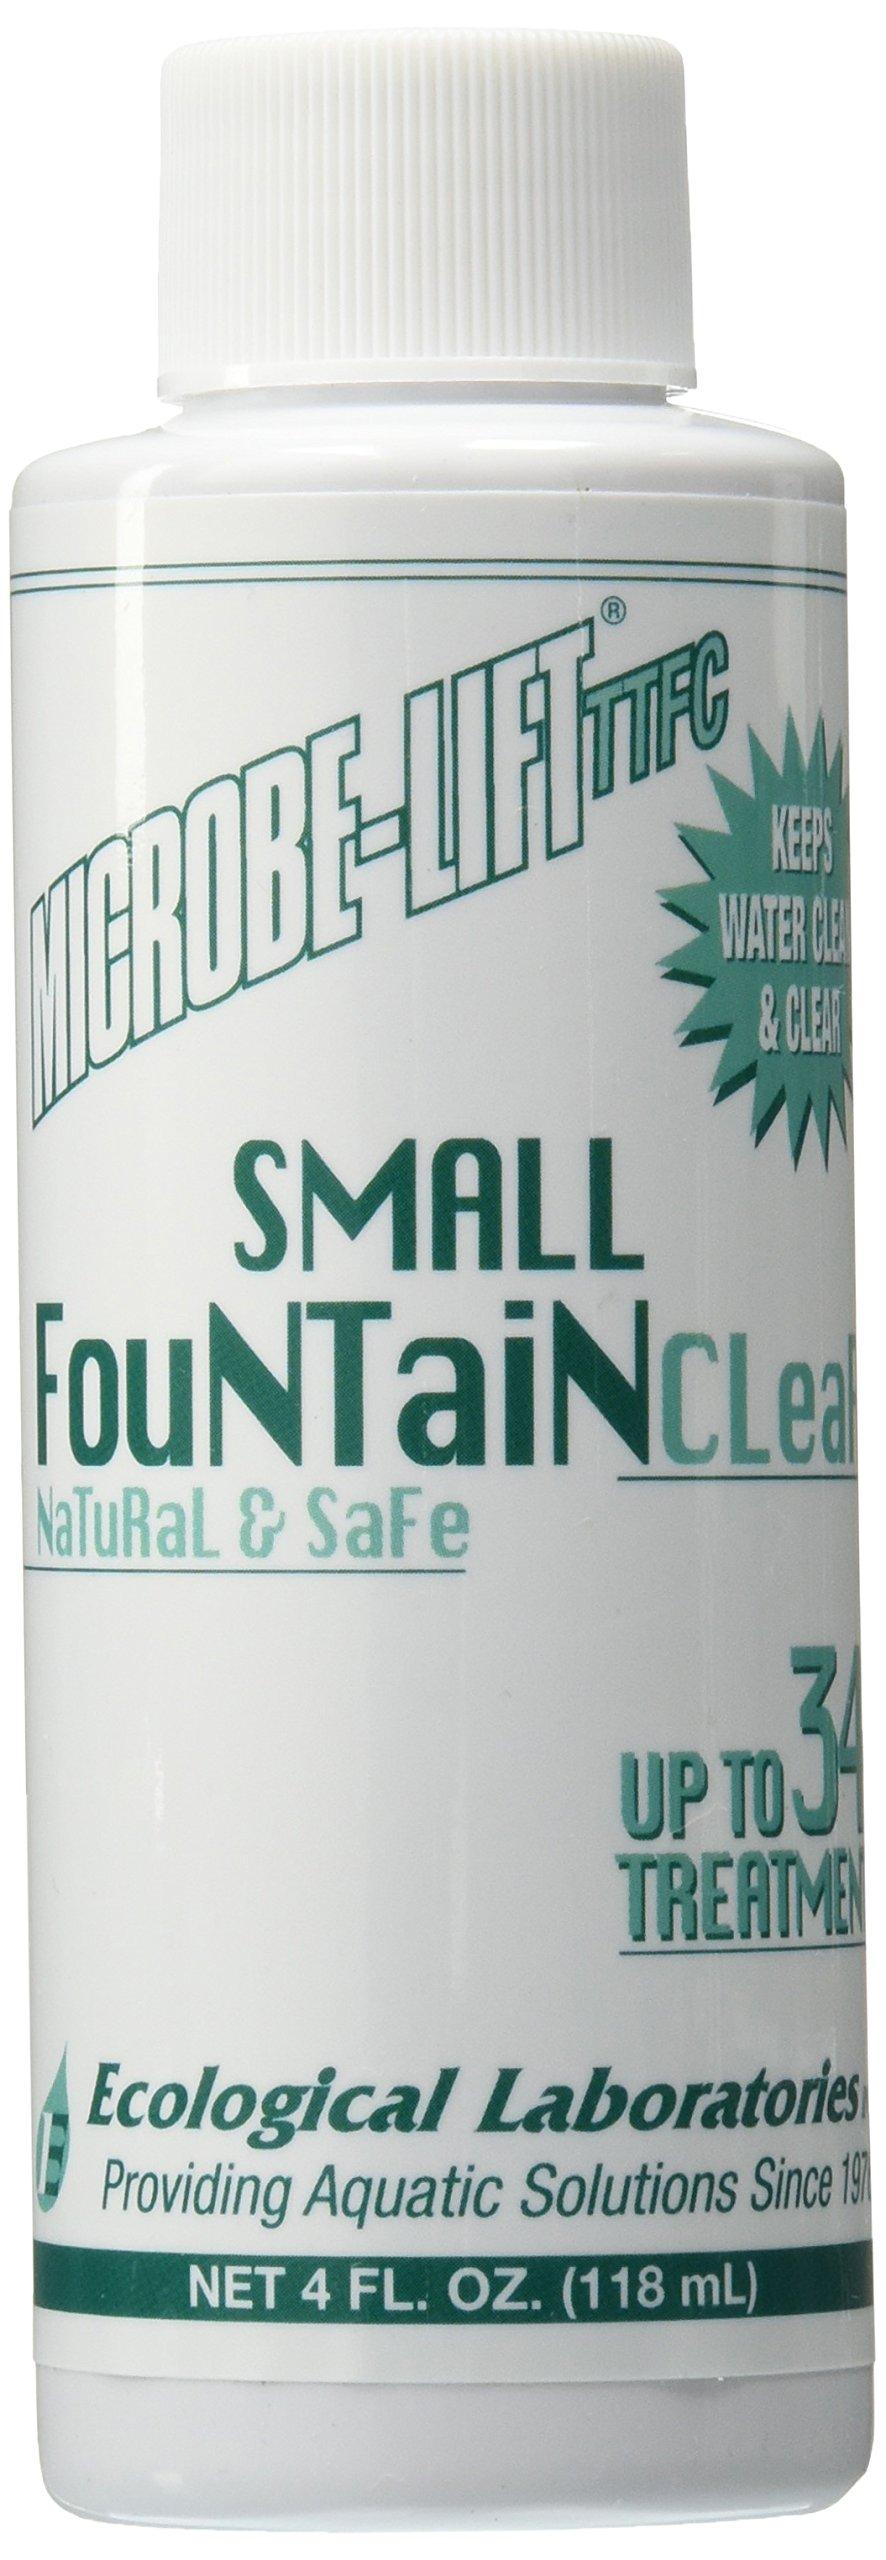 Ecological Labs 10TTFC4 Microbe Lift Small Fountain Clear, 4-Ounce